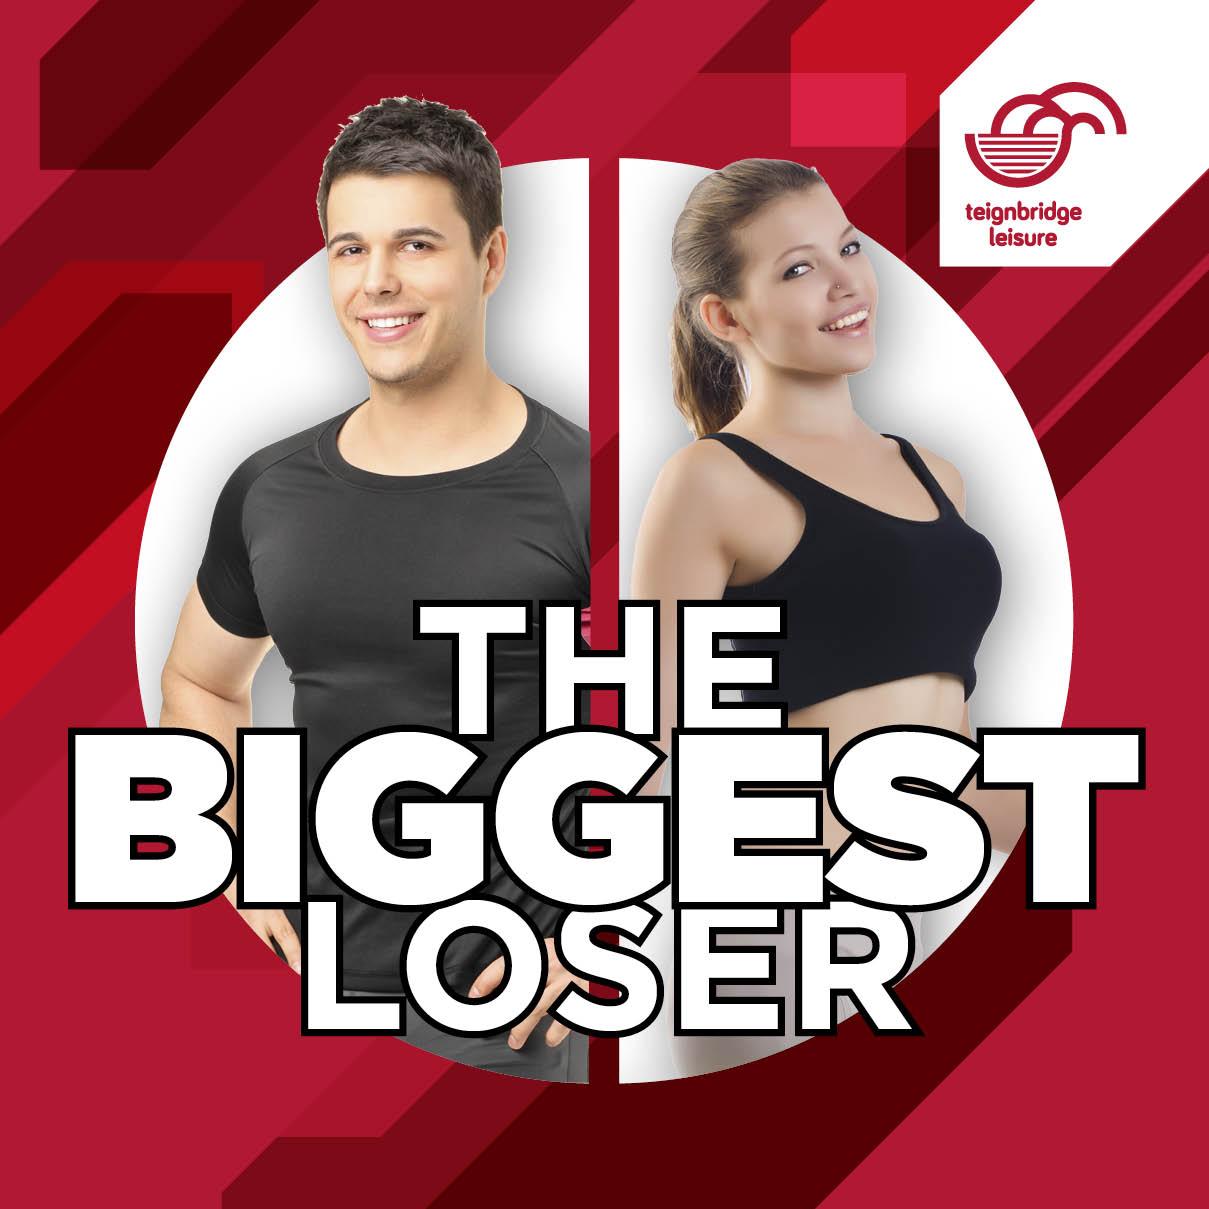 The Biggest Loser, Newton Abbot Leisure Centre, Broadmeadow Sports Centre, Dawlish Leisure Centre